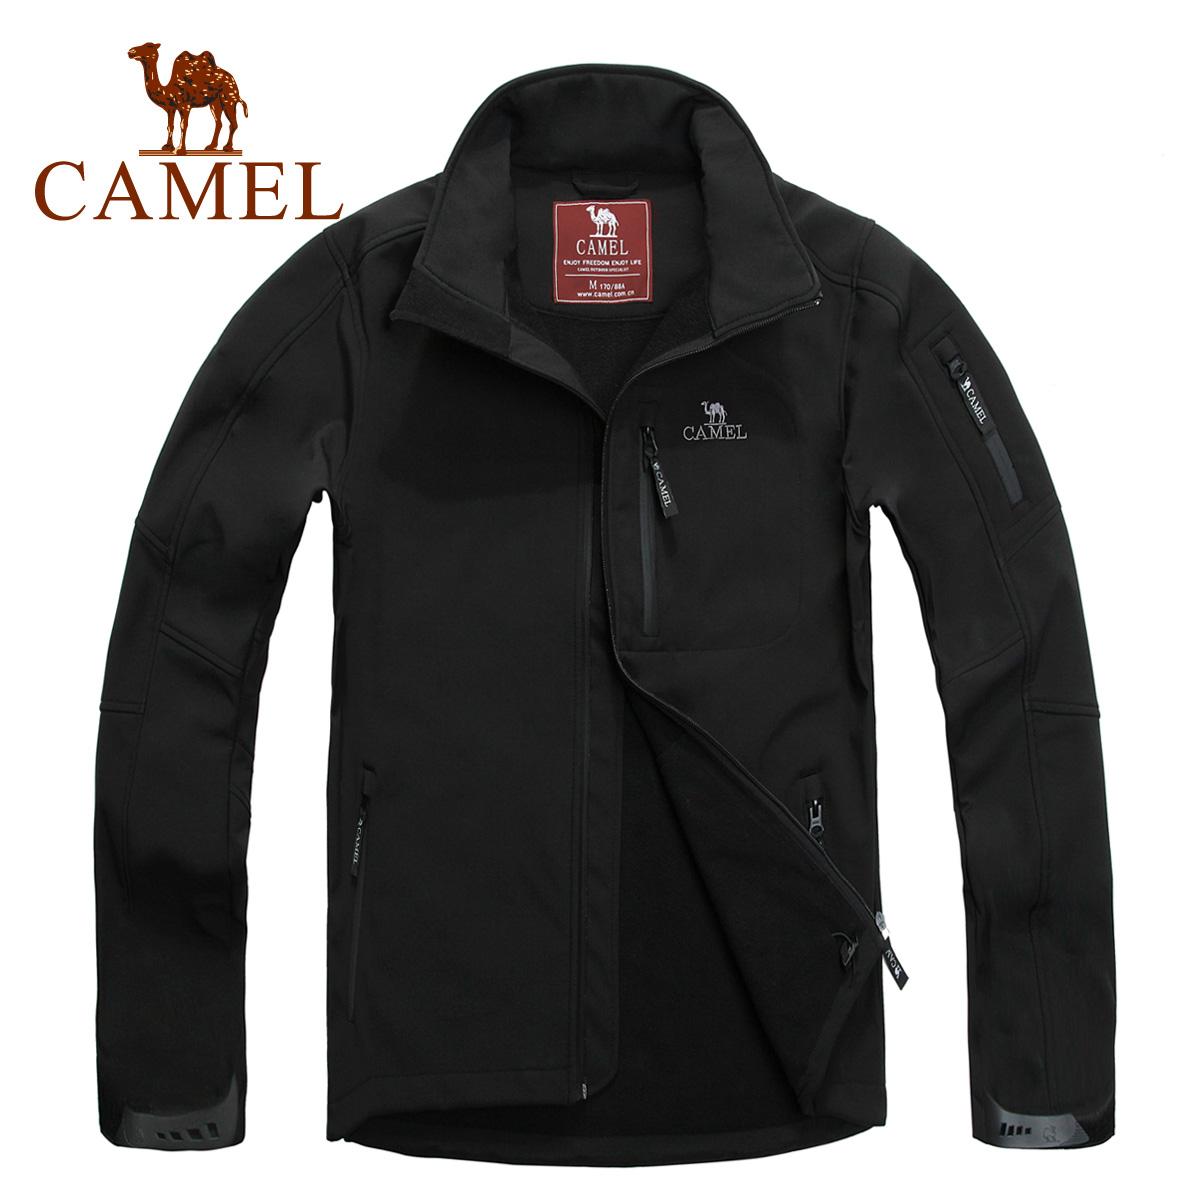 camel骆驼户外软壳衣 男款 户外防水透气软壳衣